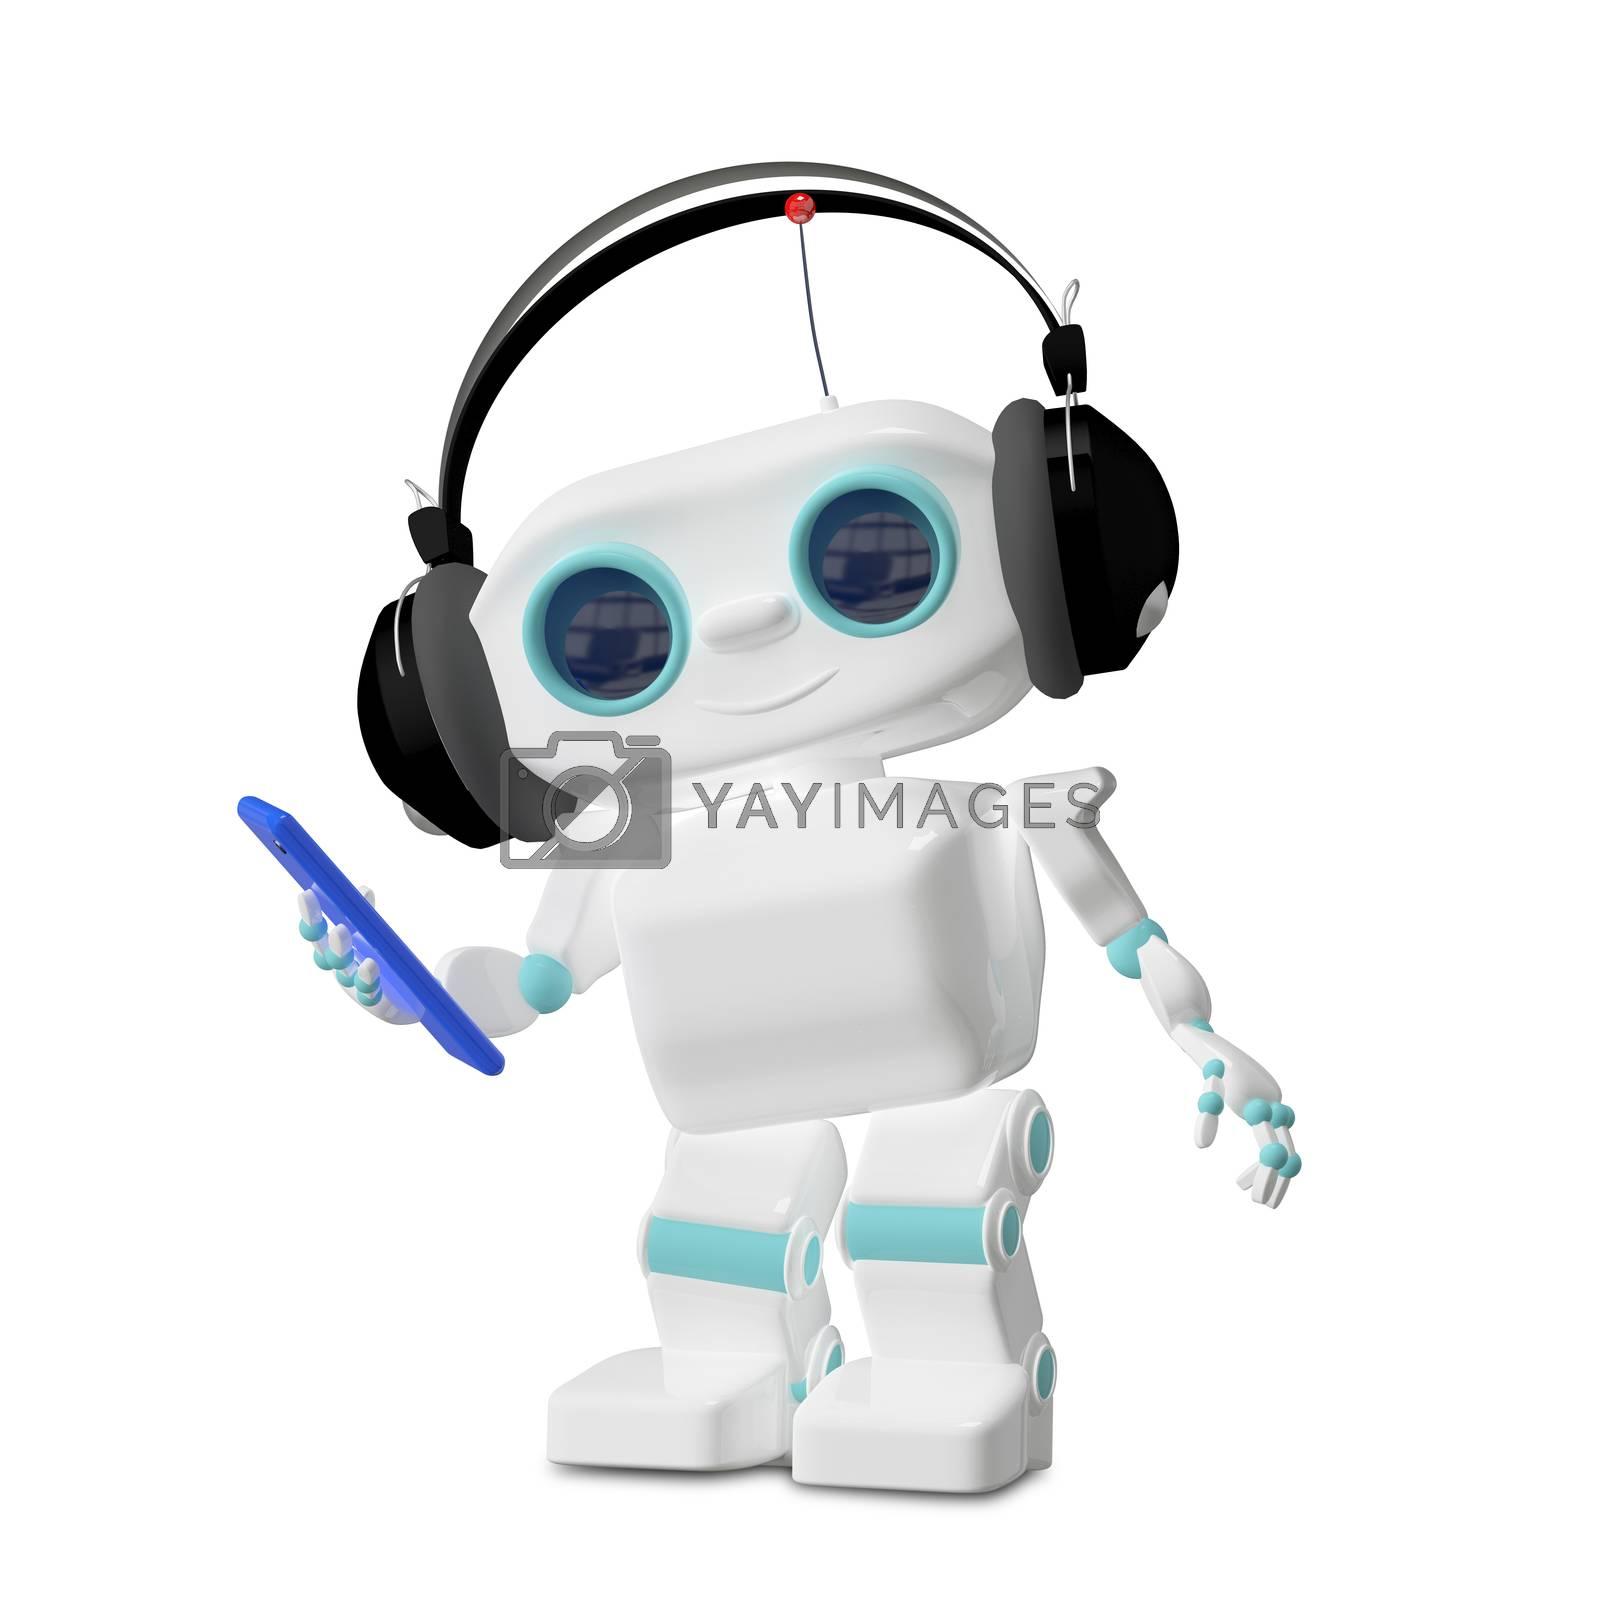 3D Illustration of the Little Robot Dances in the Headphones